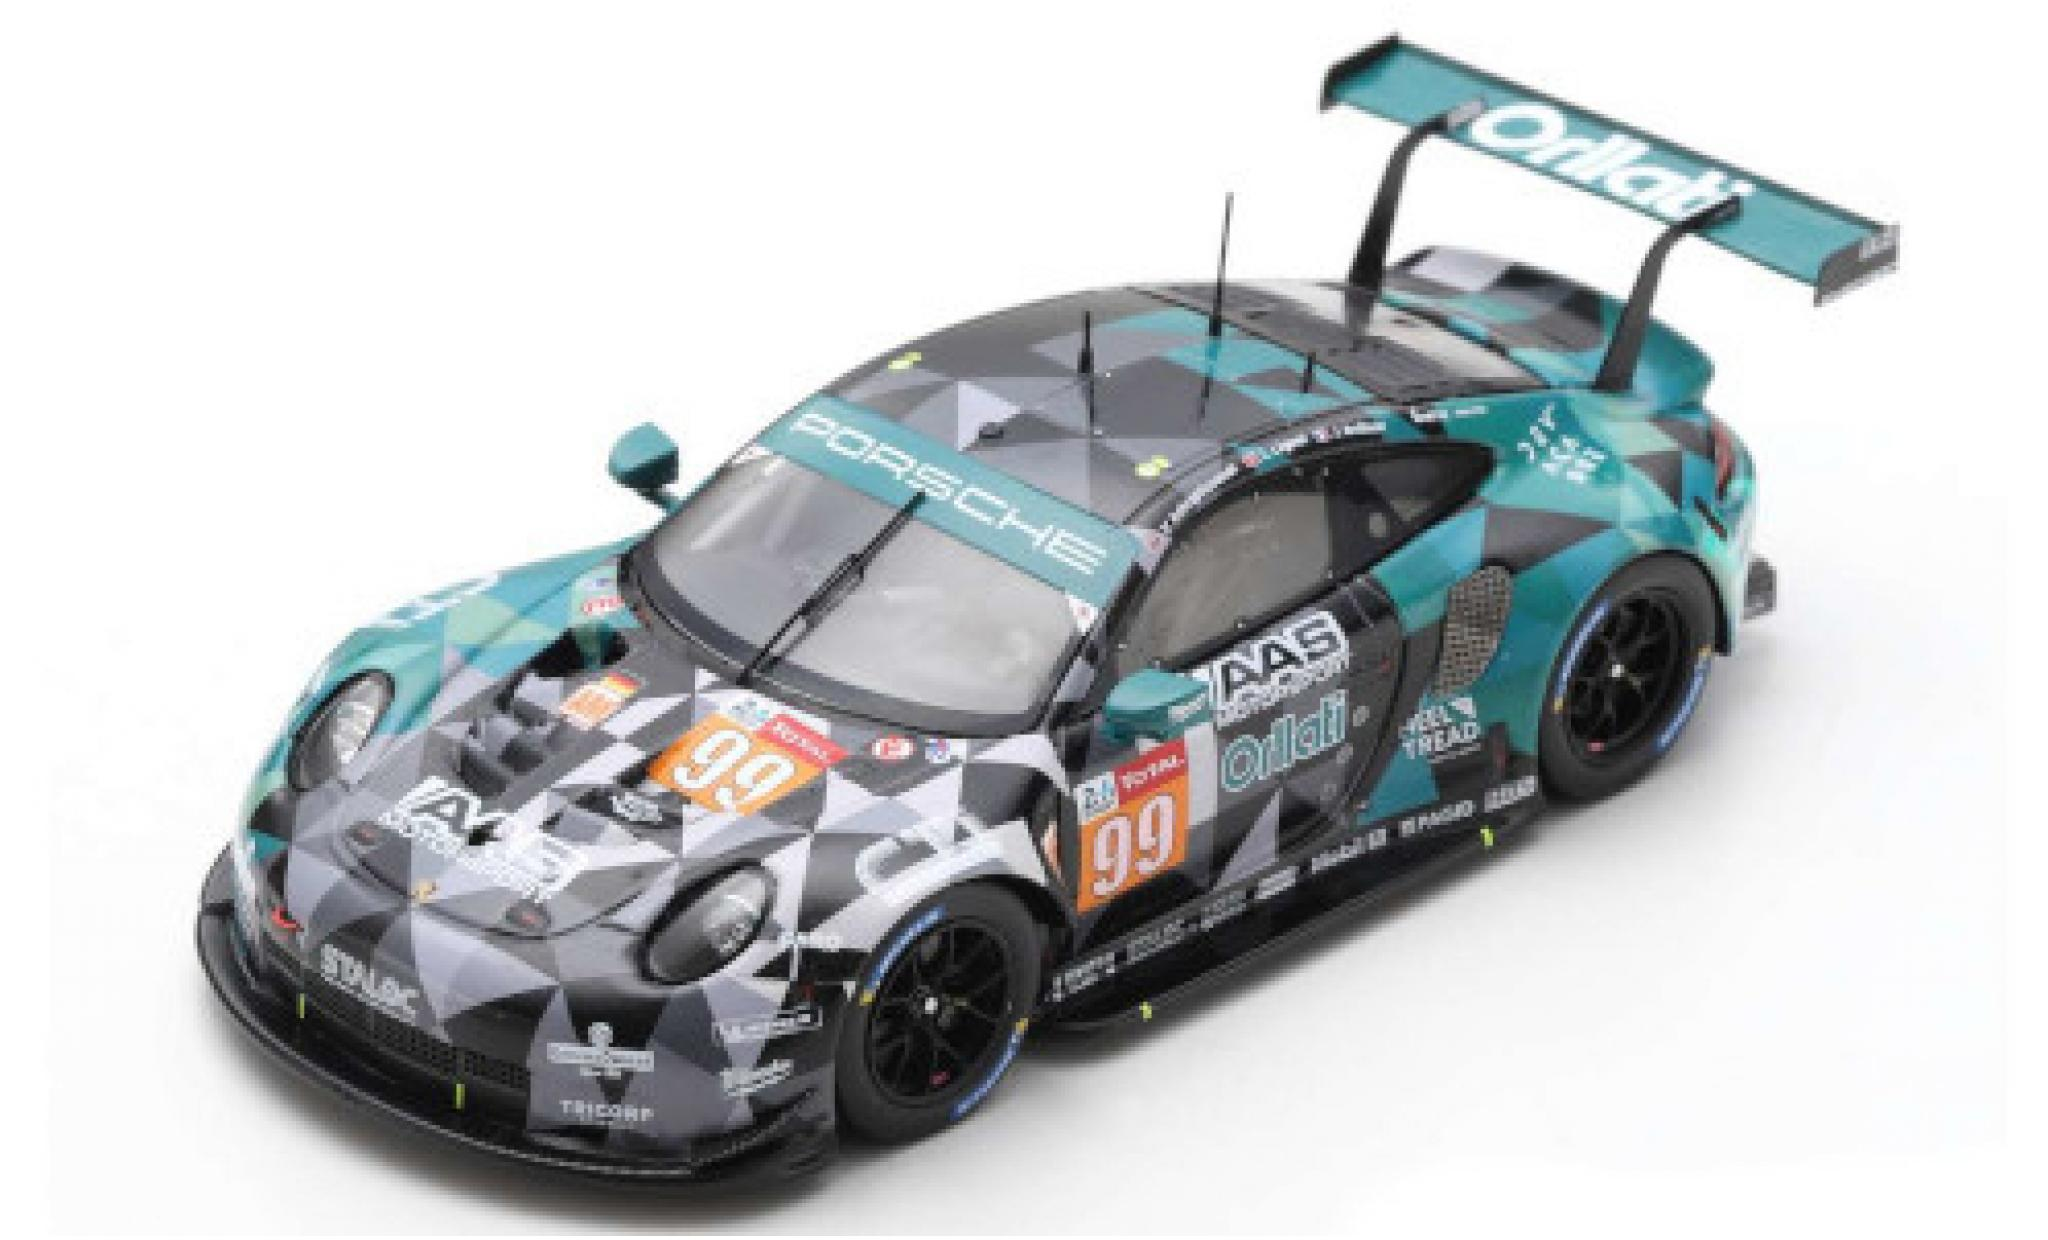 Porsche 992 RSR 1/43 Spark 911 No.99 Dempsey-Prougeon Racing / AAS Motorsport Orllati 24h Le Mans 2020 J.Andlauer/V.Inthraphuvasak/L.Legeret